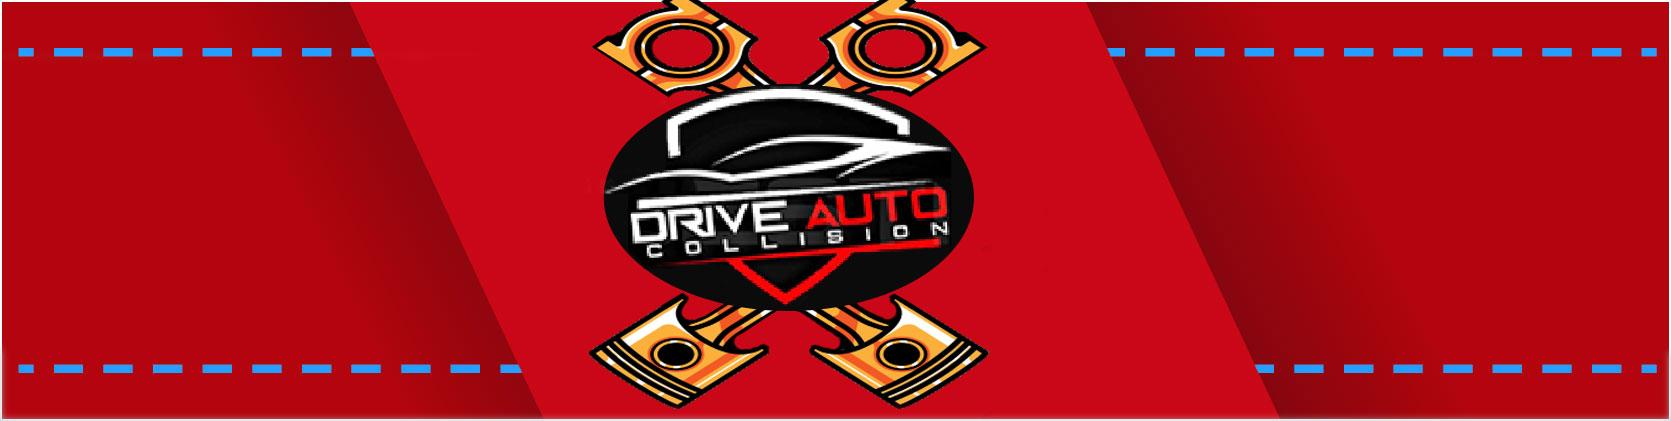 Drive-Auto-Collision_Iconss-03